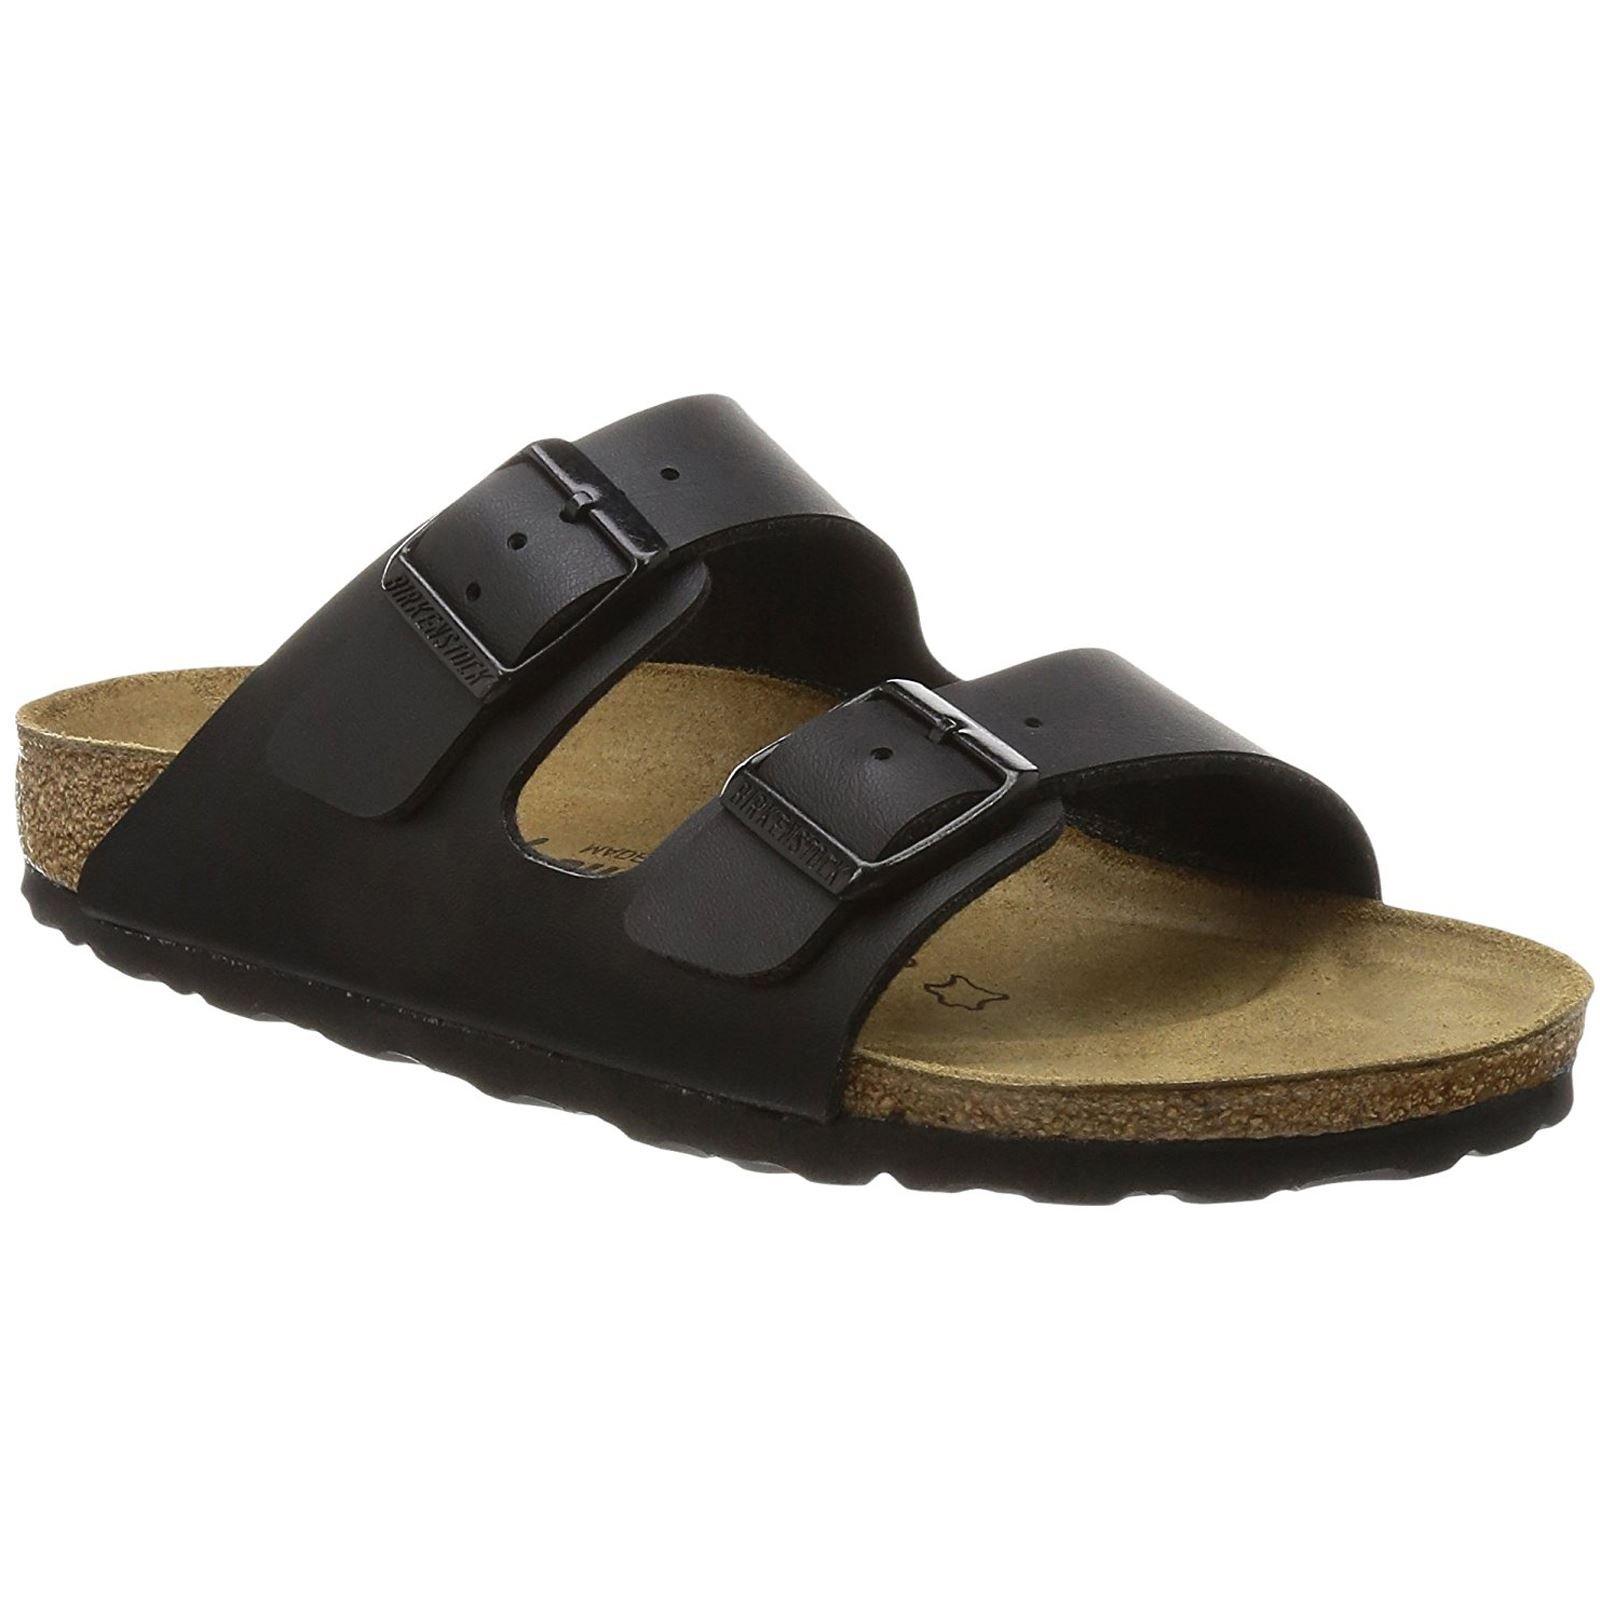 Birkenstock Arizona Sandal Black Leather Size 41